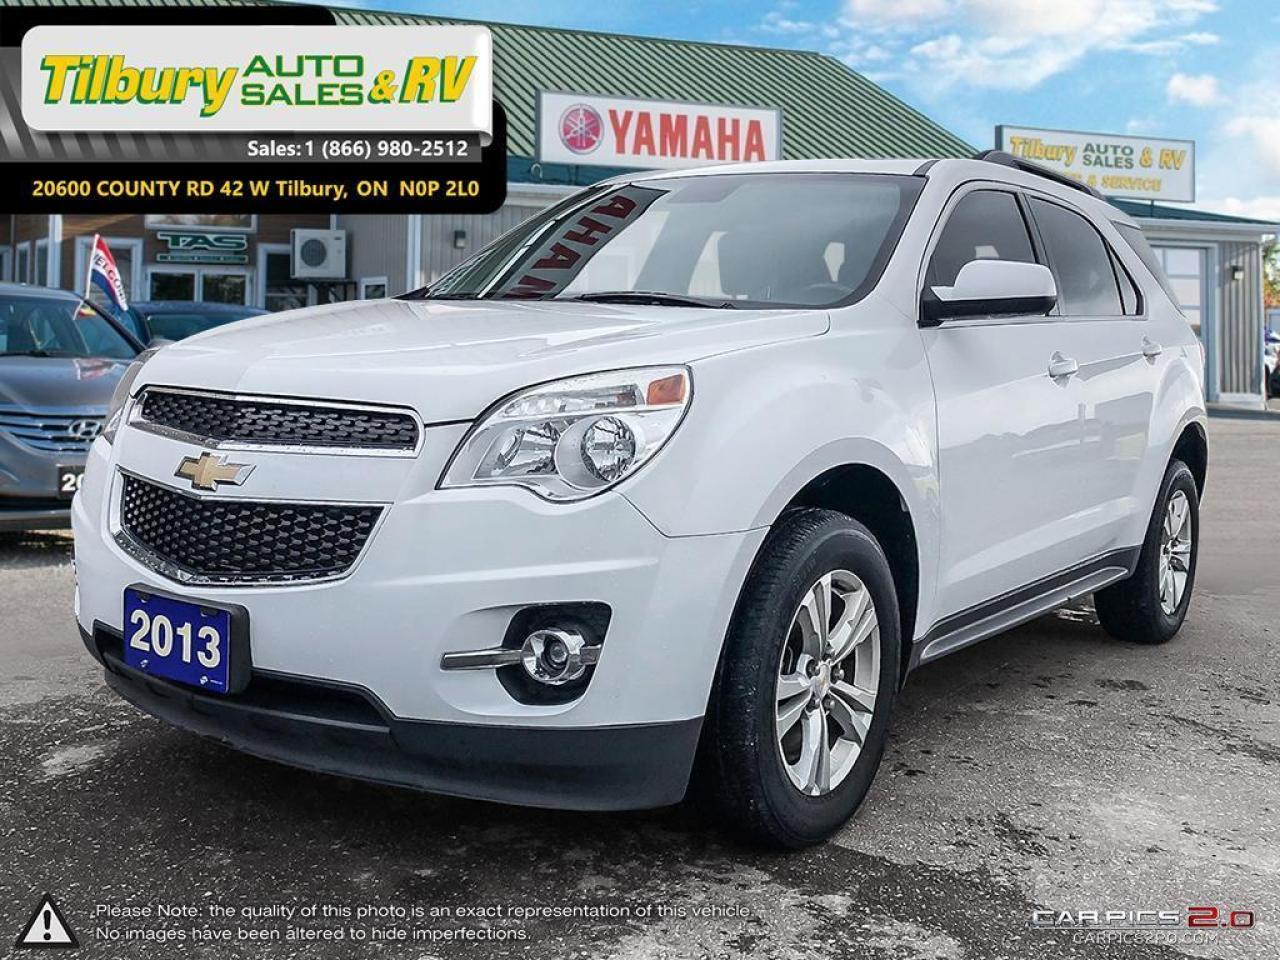 2013 Chevrolet Equinox LT. DIAMOND WHITE